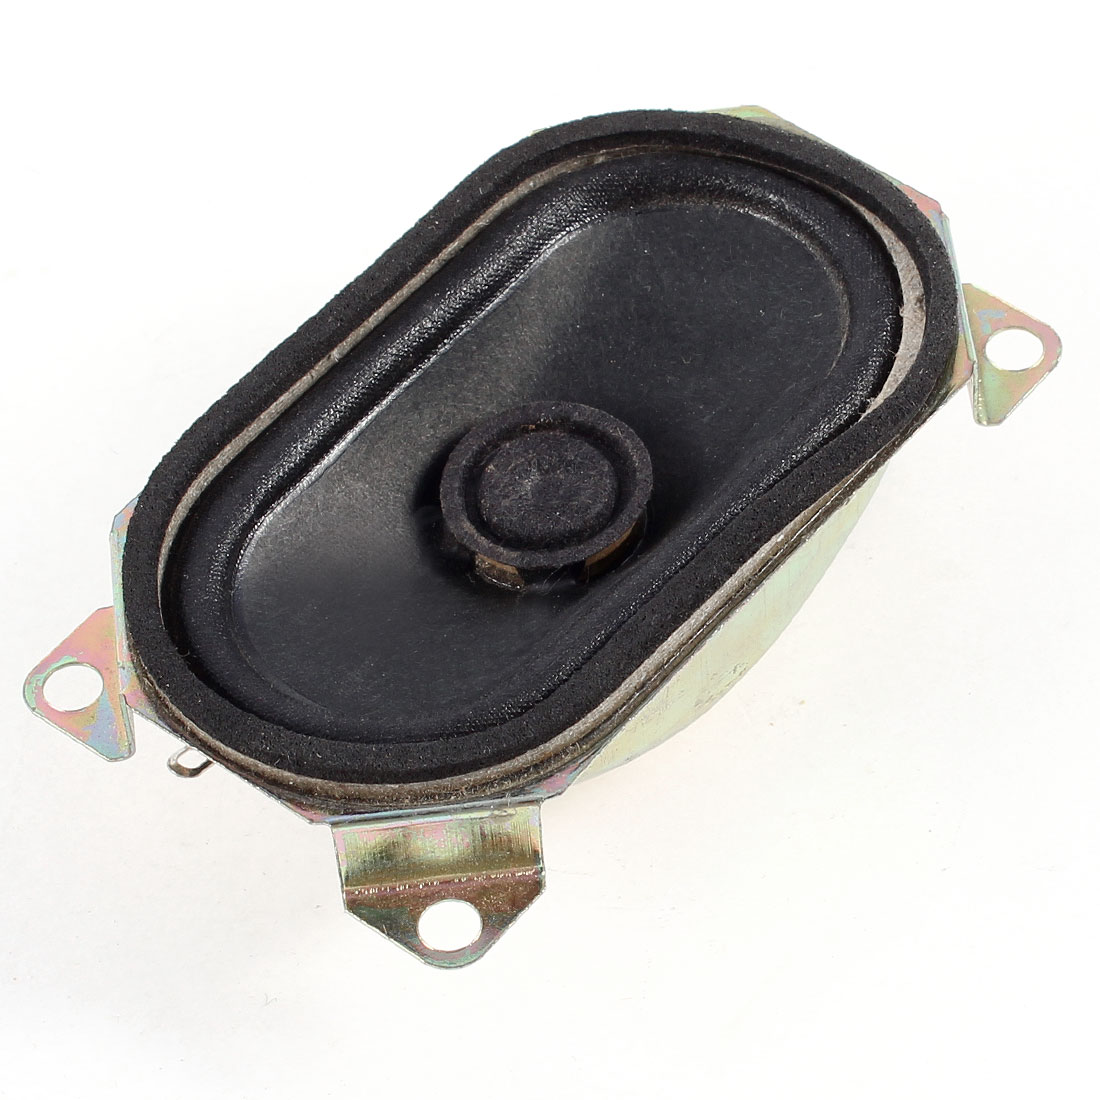 70mmx40mm Metal Rectangular Internal Magnet Speaker 5 Watt 4 Ohm